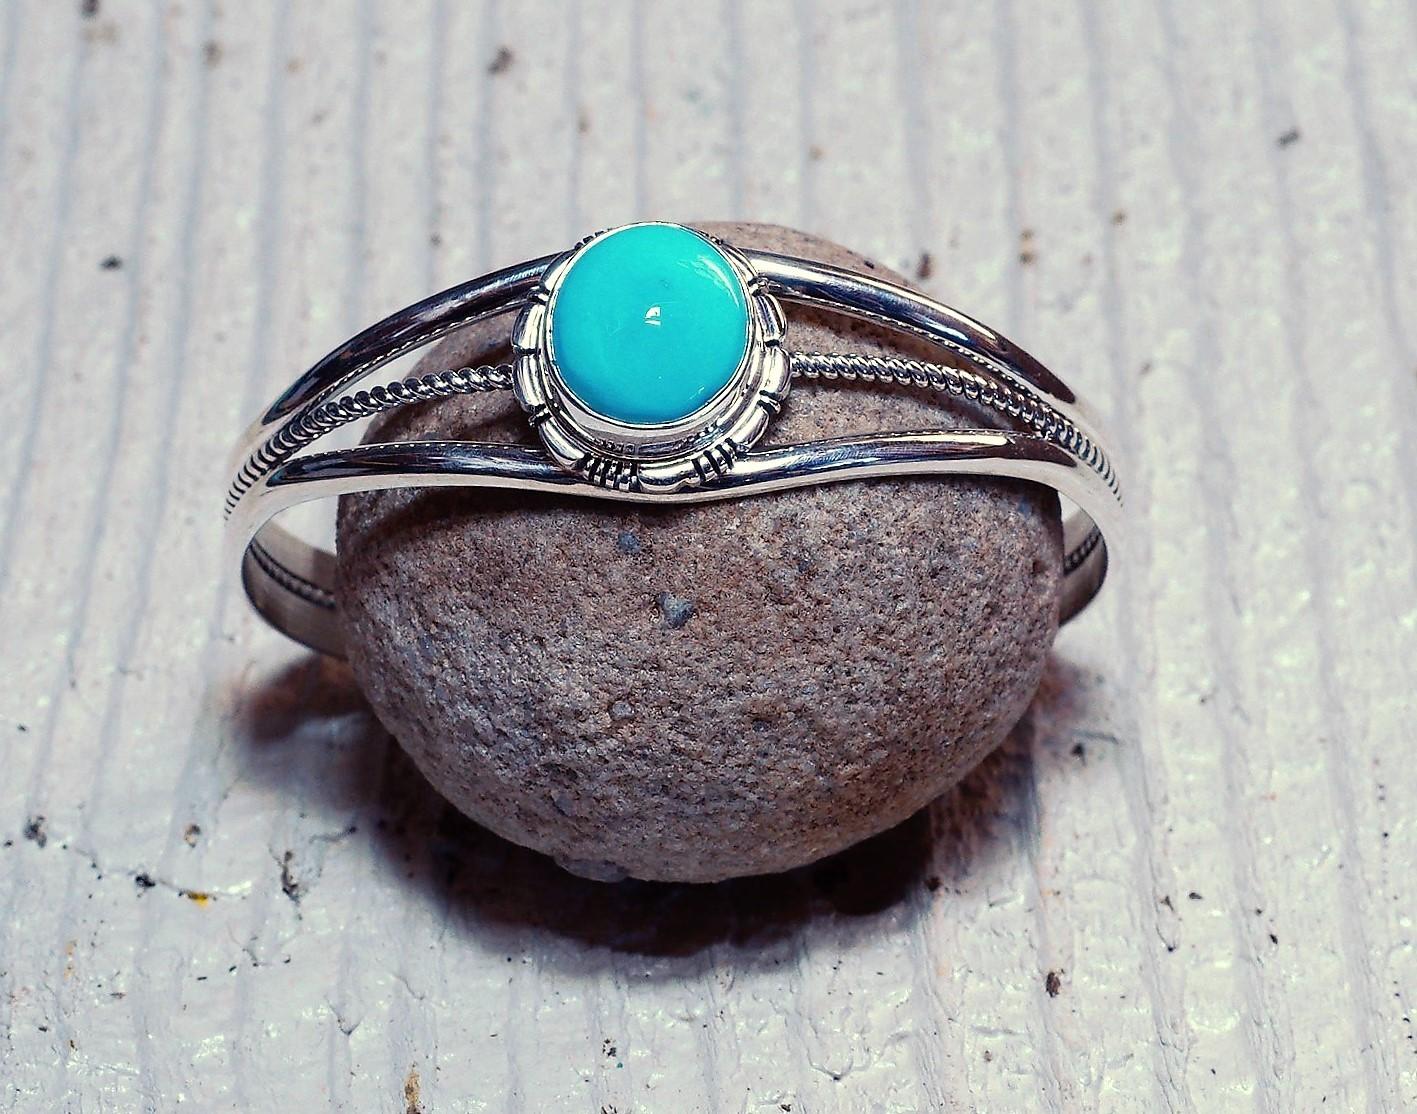 Robin Egg Sleeping Beauty Turquoise Cuff Bracelet - medium stone SB160068